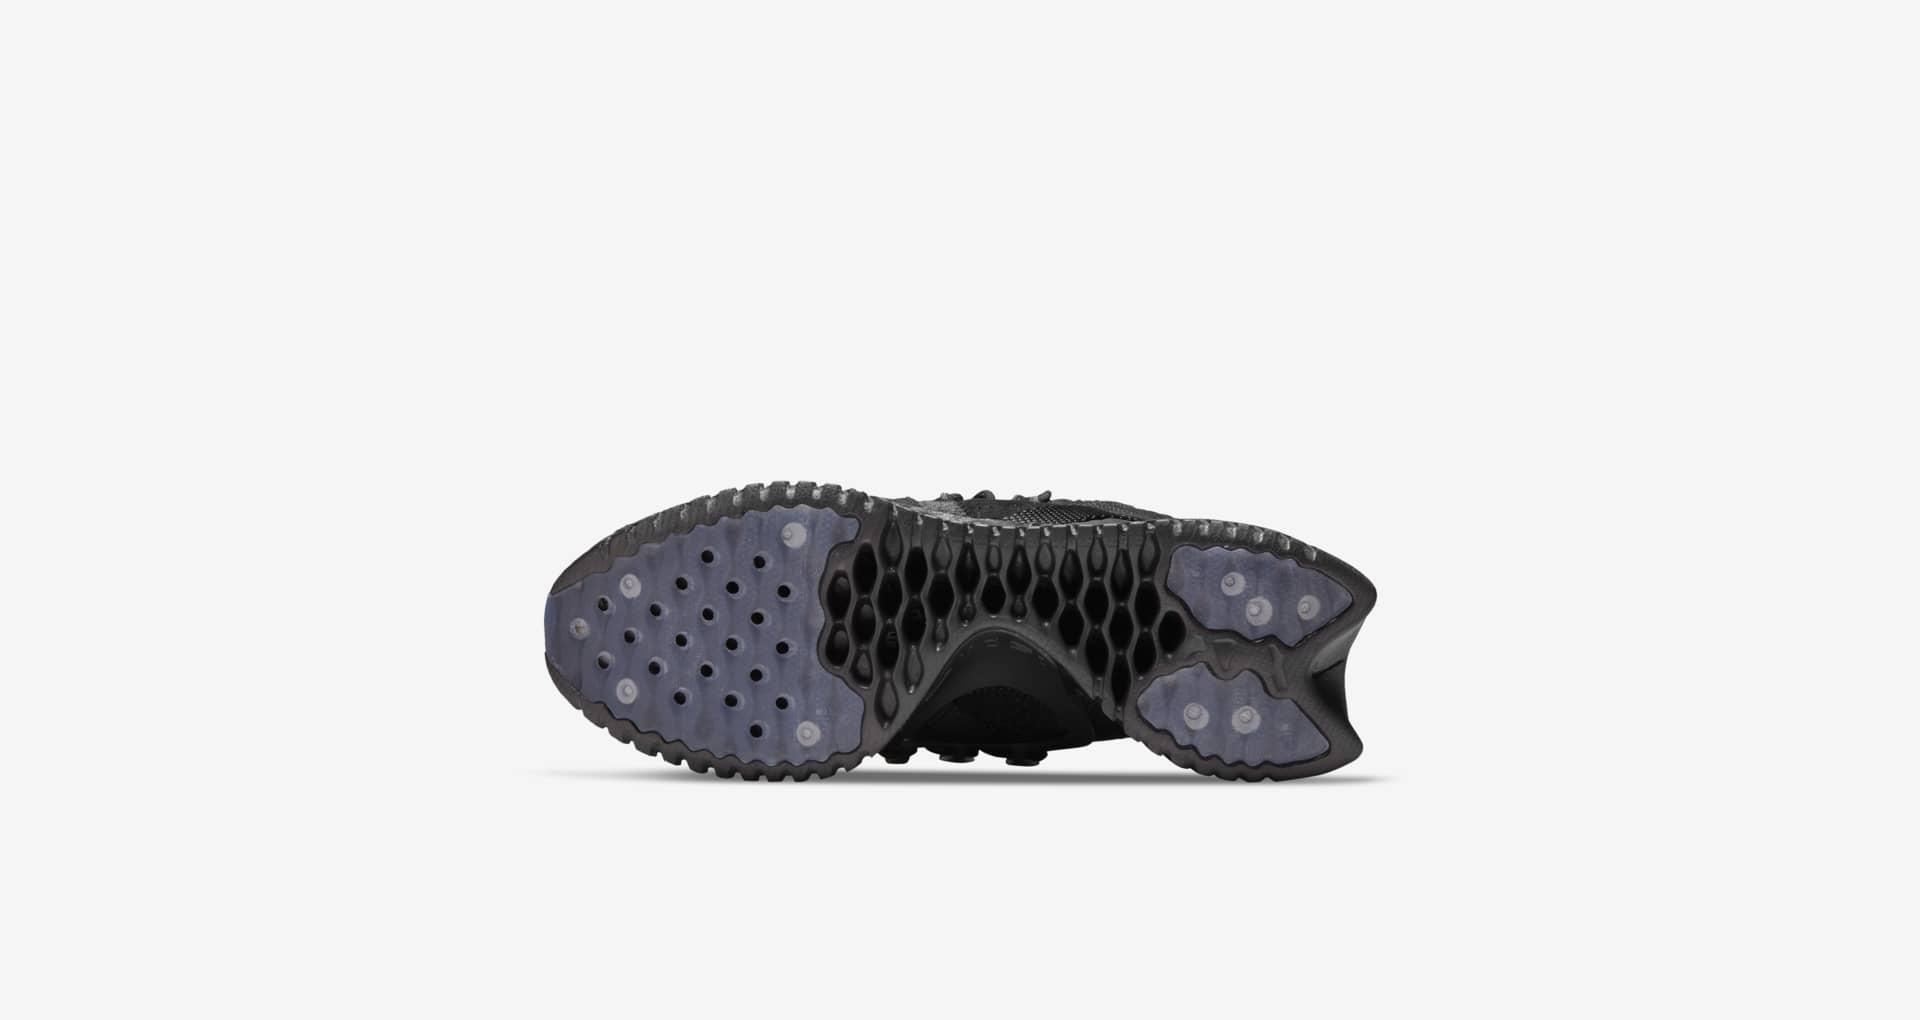 Nike,Air VaporMax Plus  SNKRS 上架!全新配色 Air VaporMax Plus 即将登场!